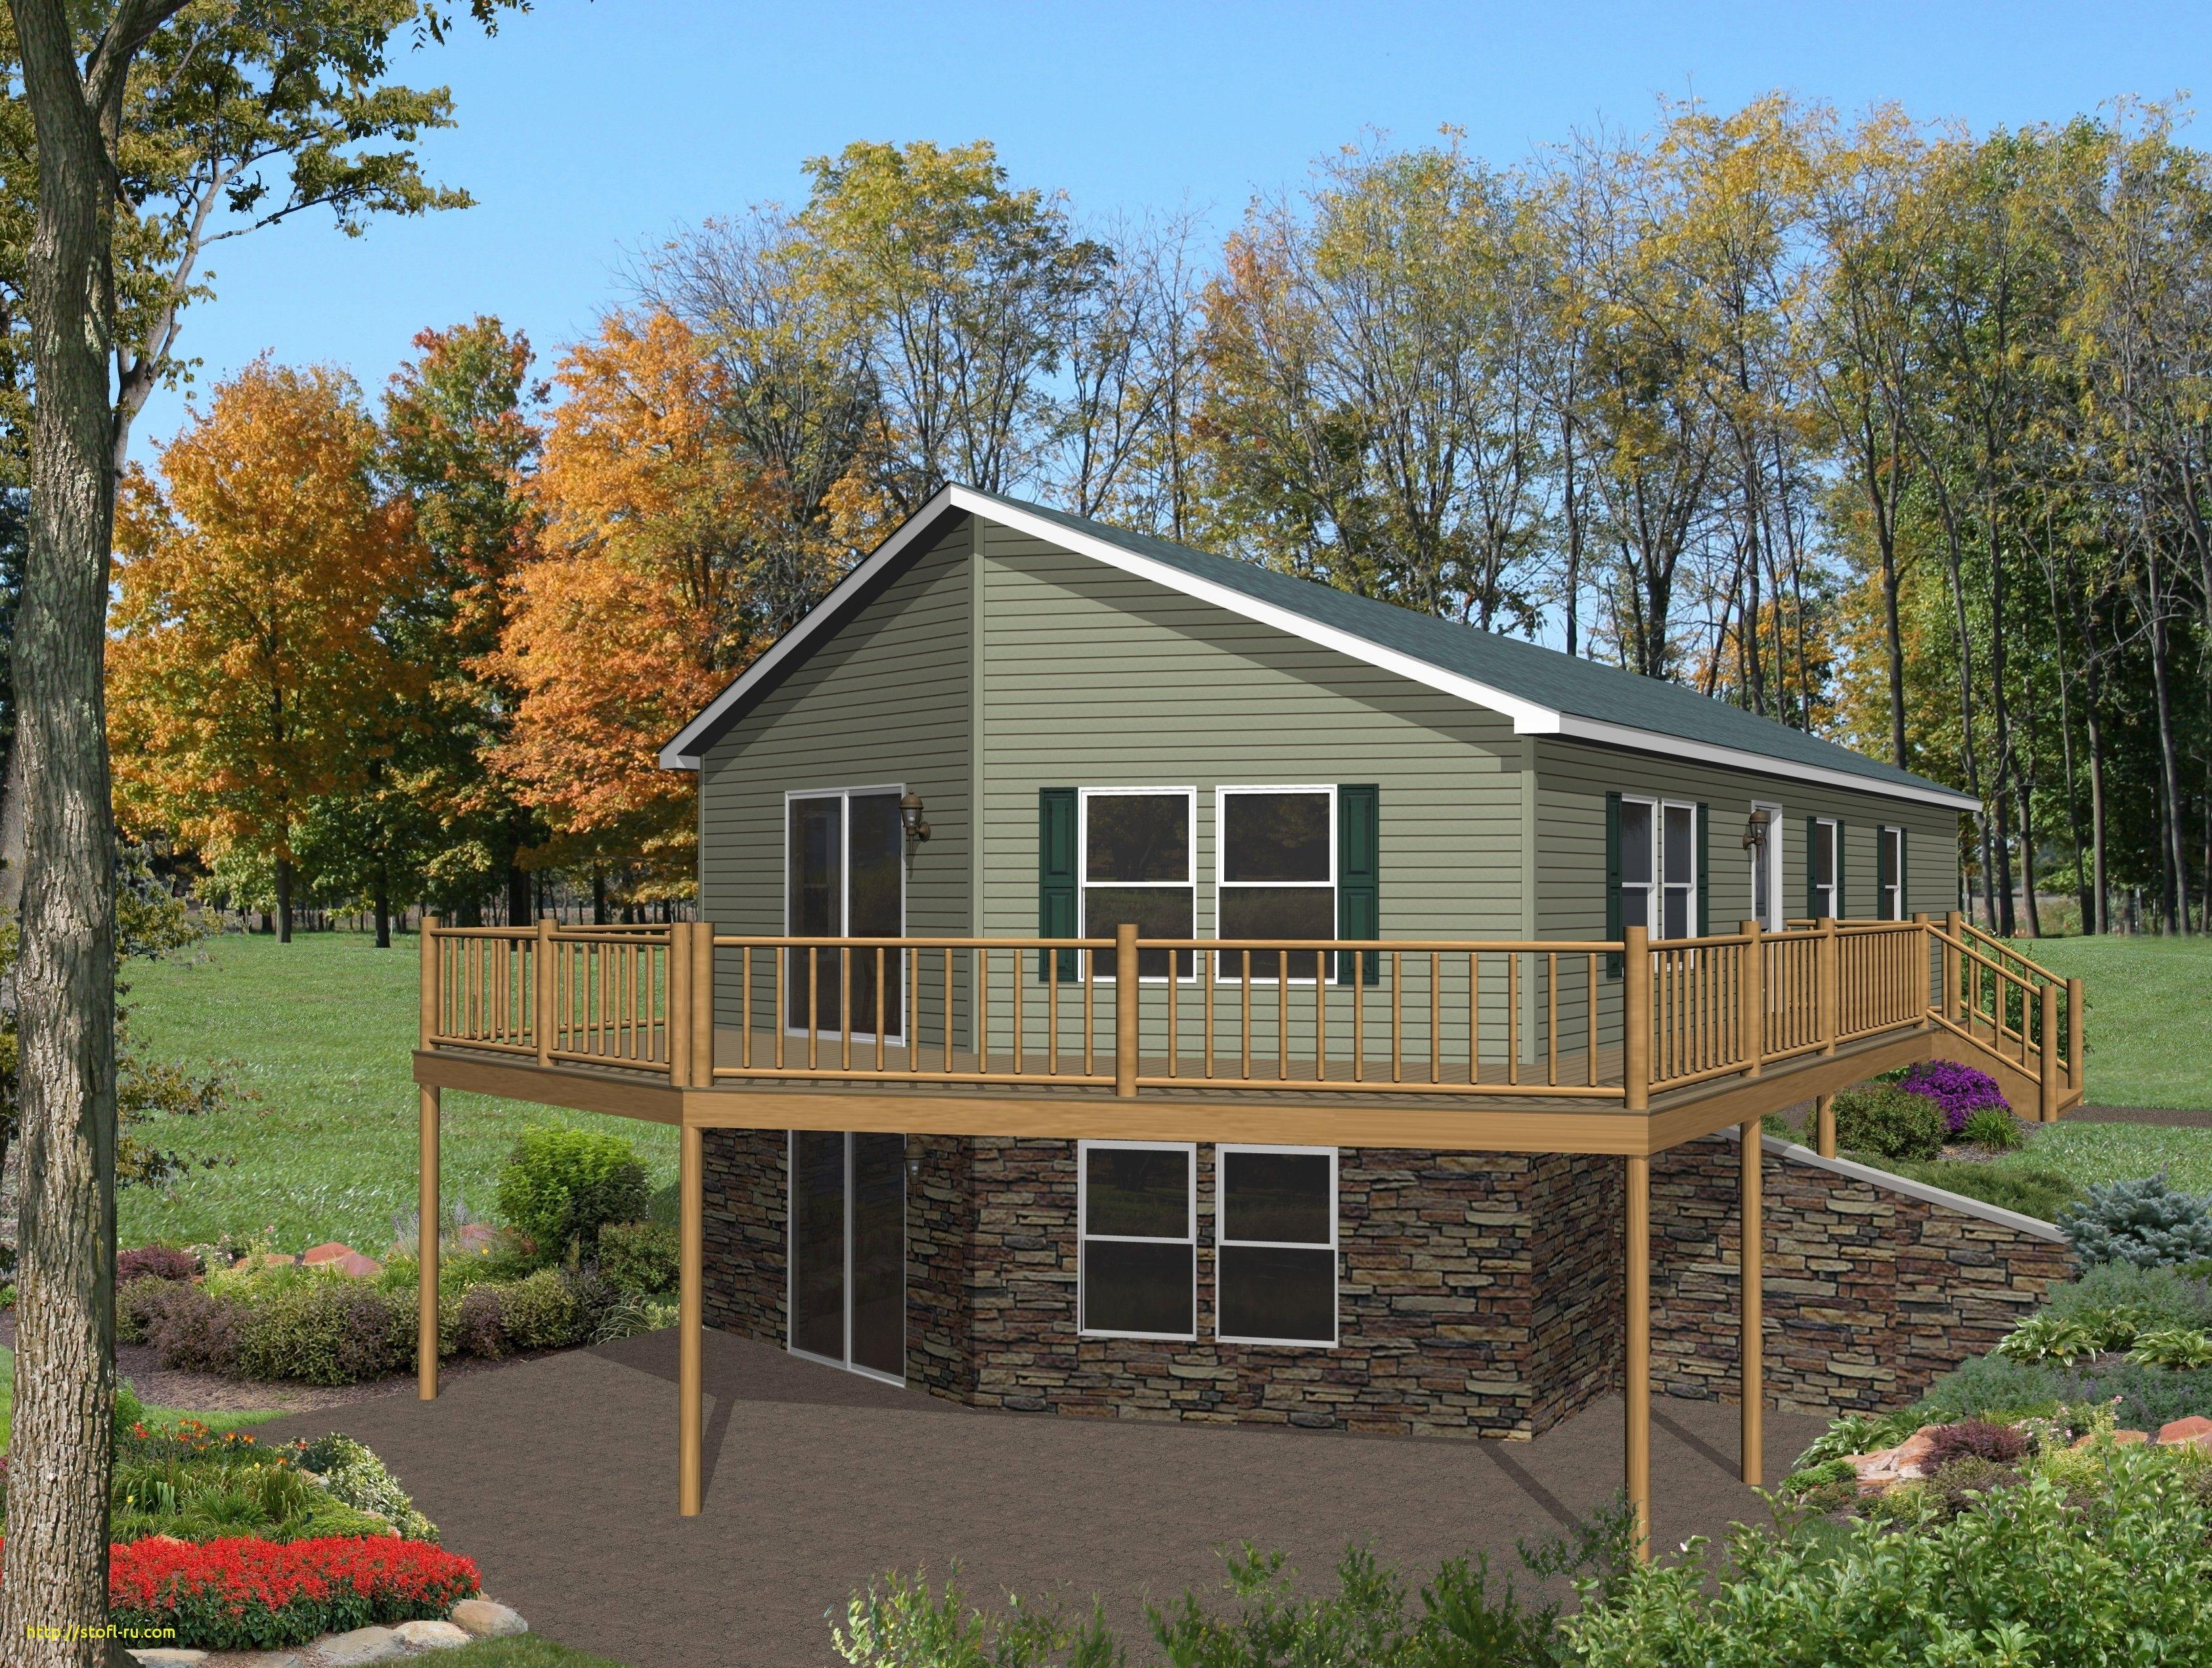 Small Cabin Plans With Walkout Basement Modern Style House Design Ideas Walkoutbasement Smallhous Ranch House Plans Basement House Plans Small Lake Houses